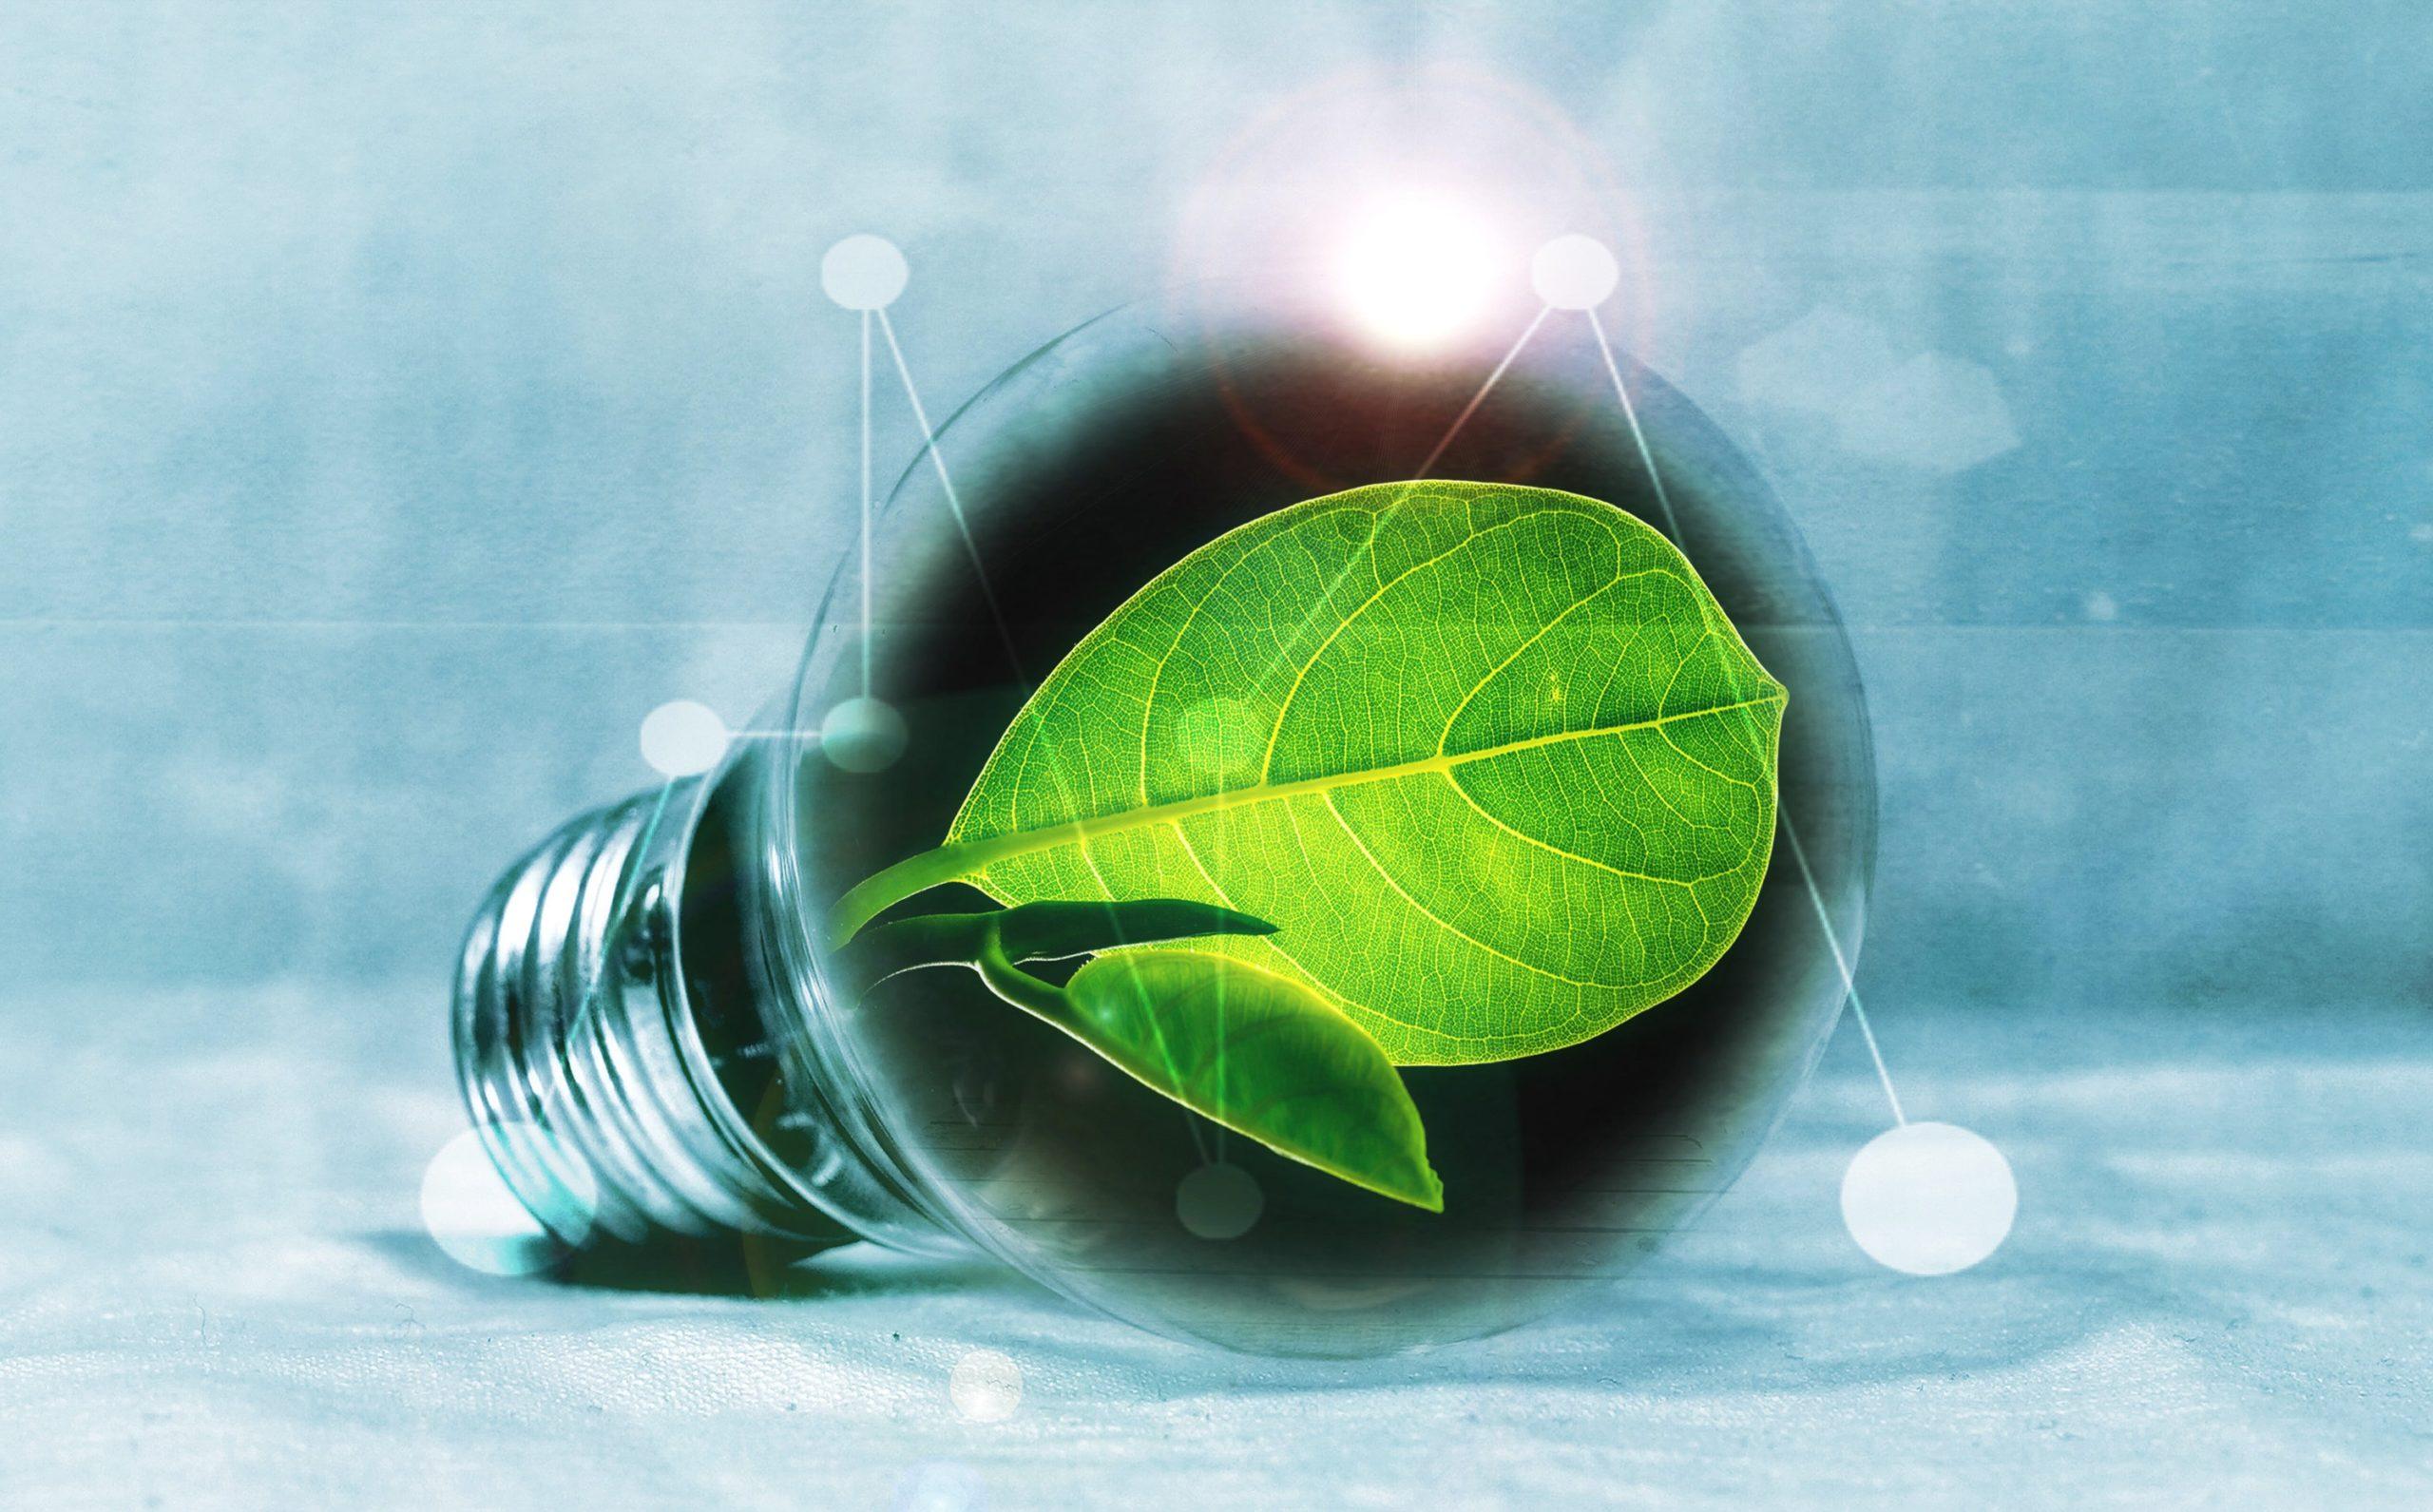 neubauten Nachhaltigkeit